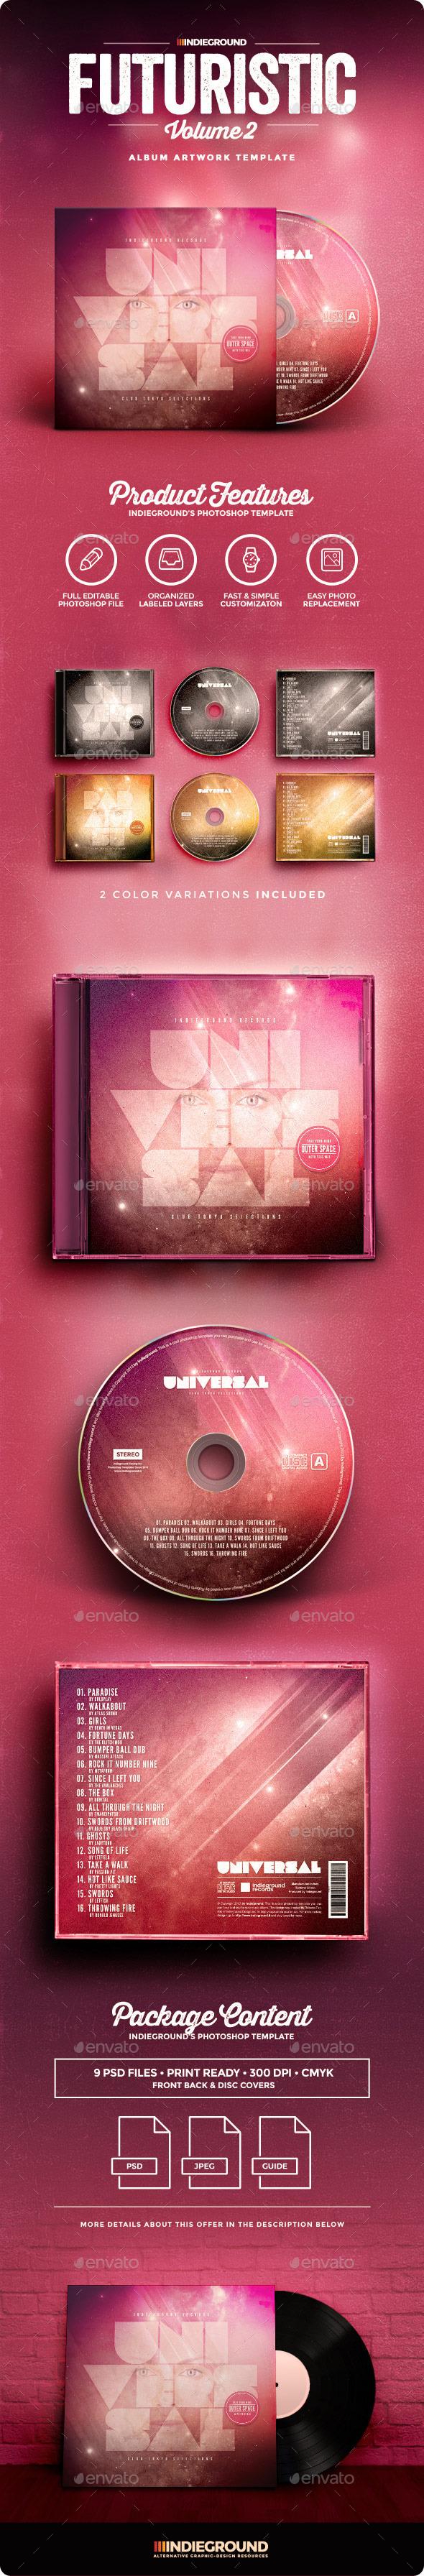 Futuristic CD Album Artwork Vol. 2 - CD & DVD Artwork Print Templates